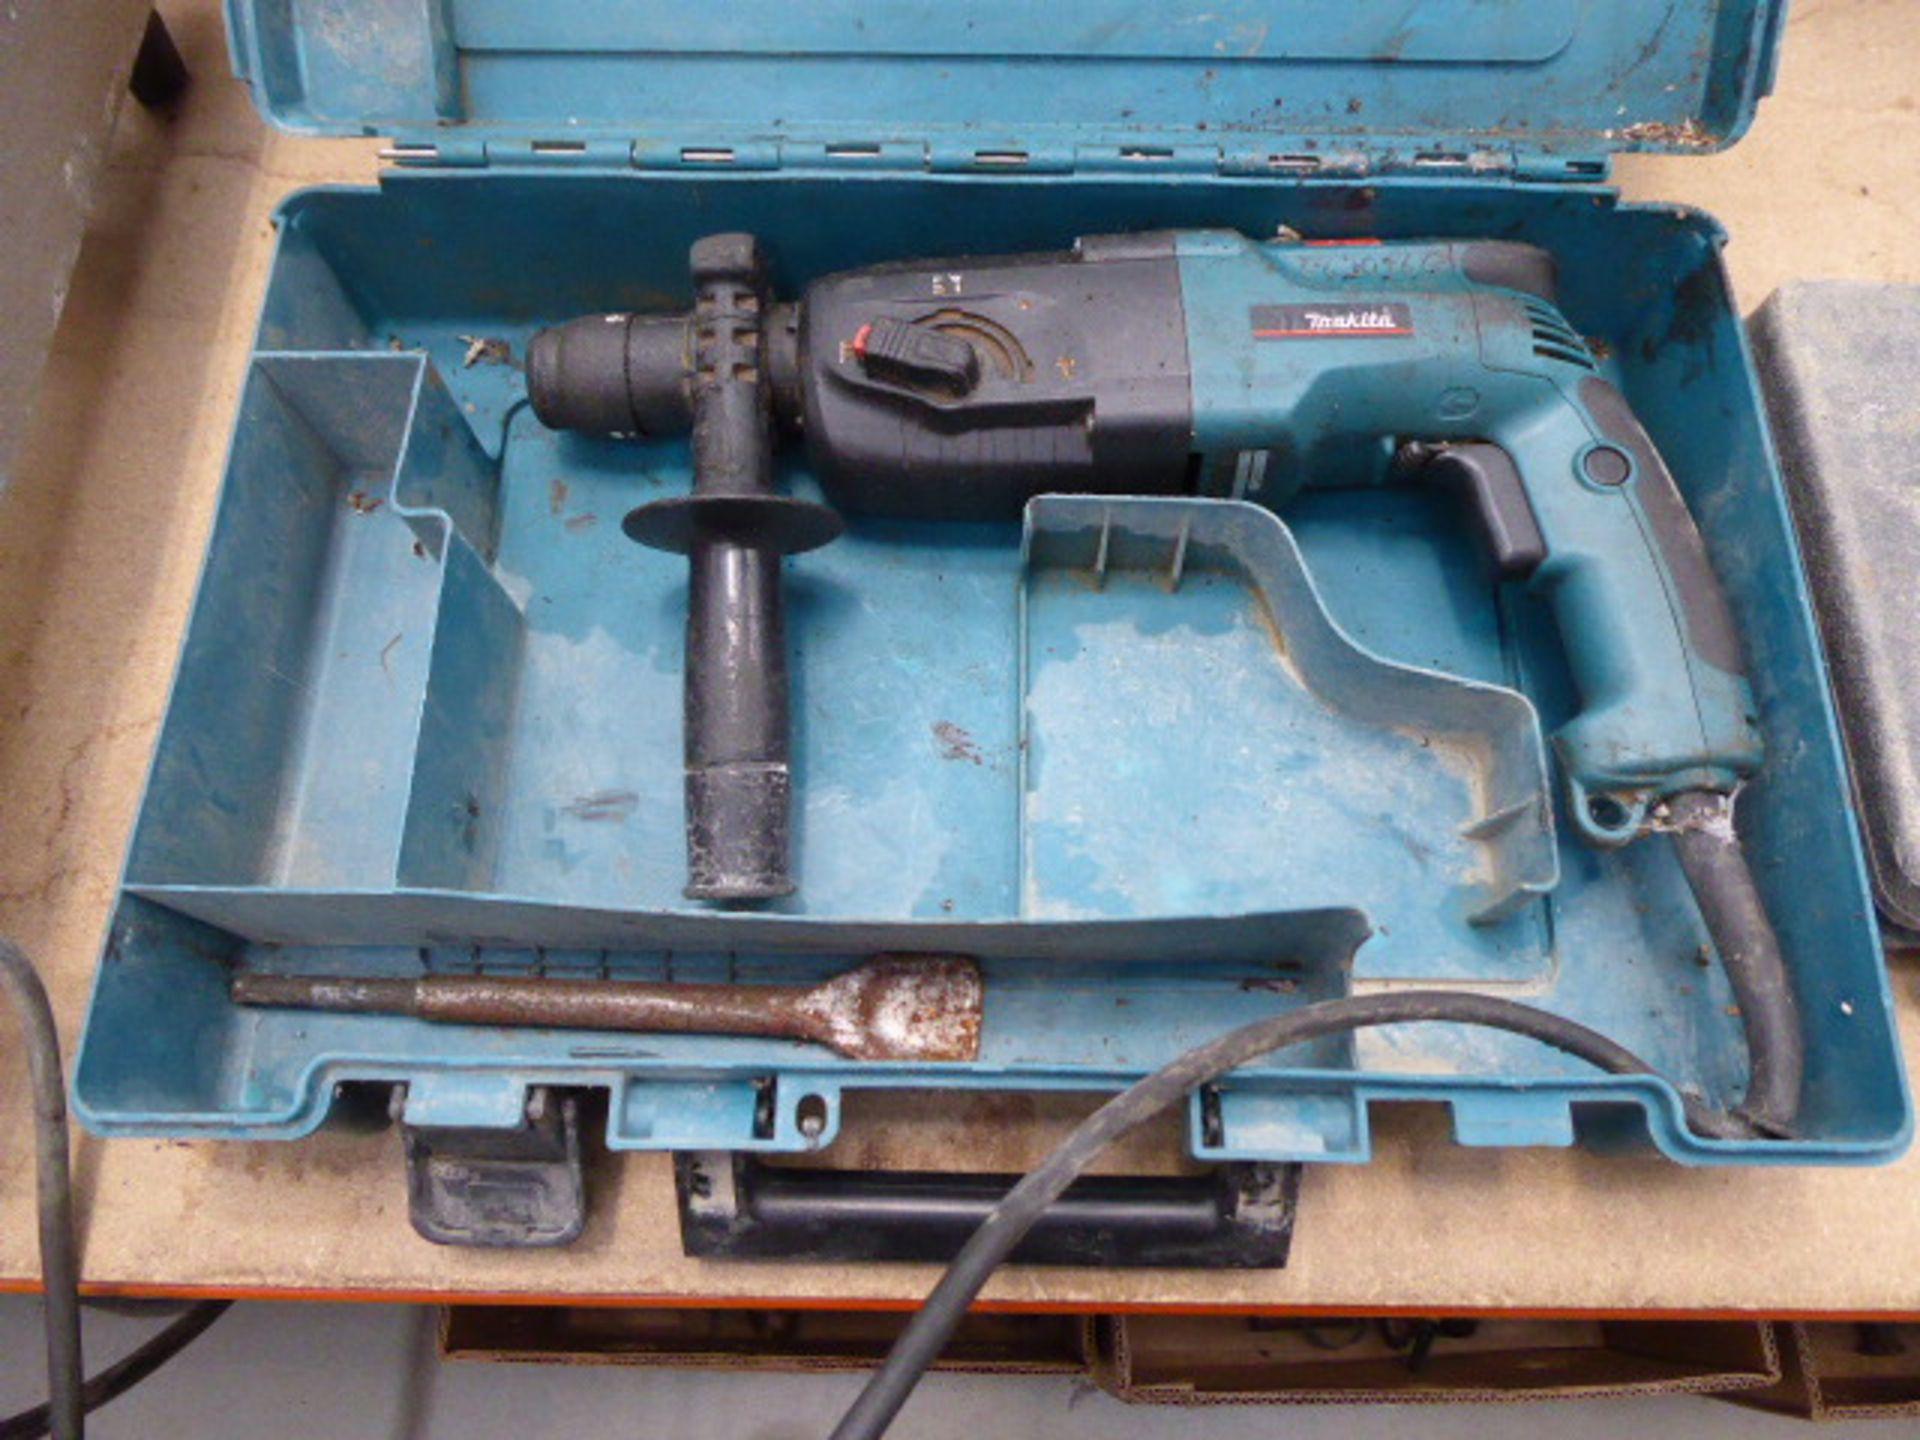 Lot 4532 - Makita 110v SdS drill and a qty of drill birs